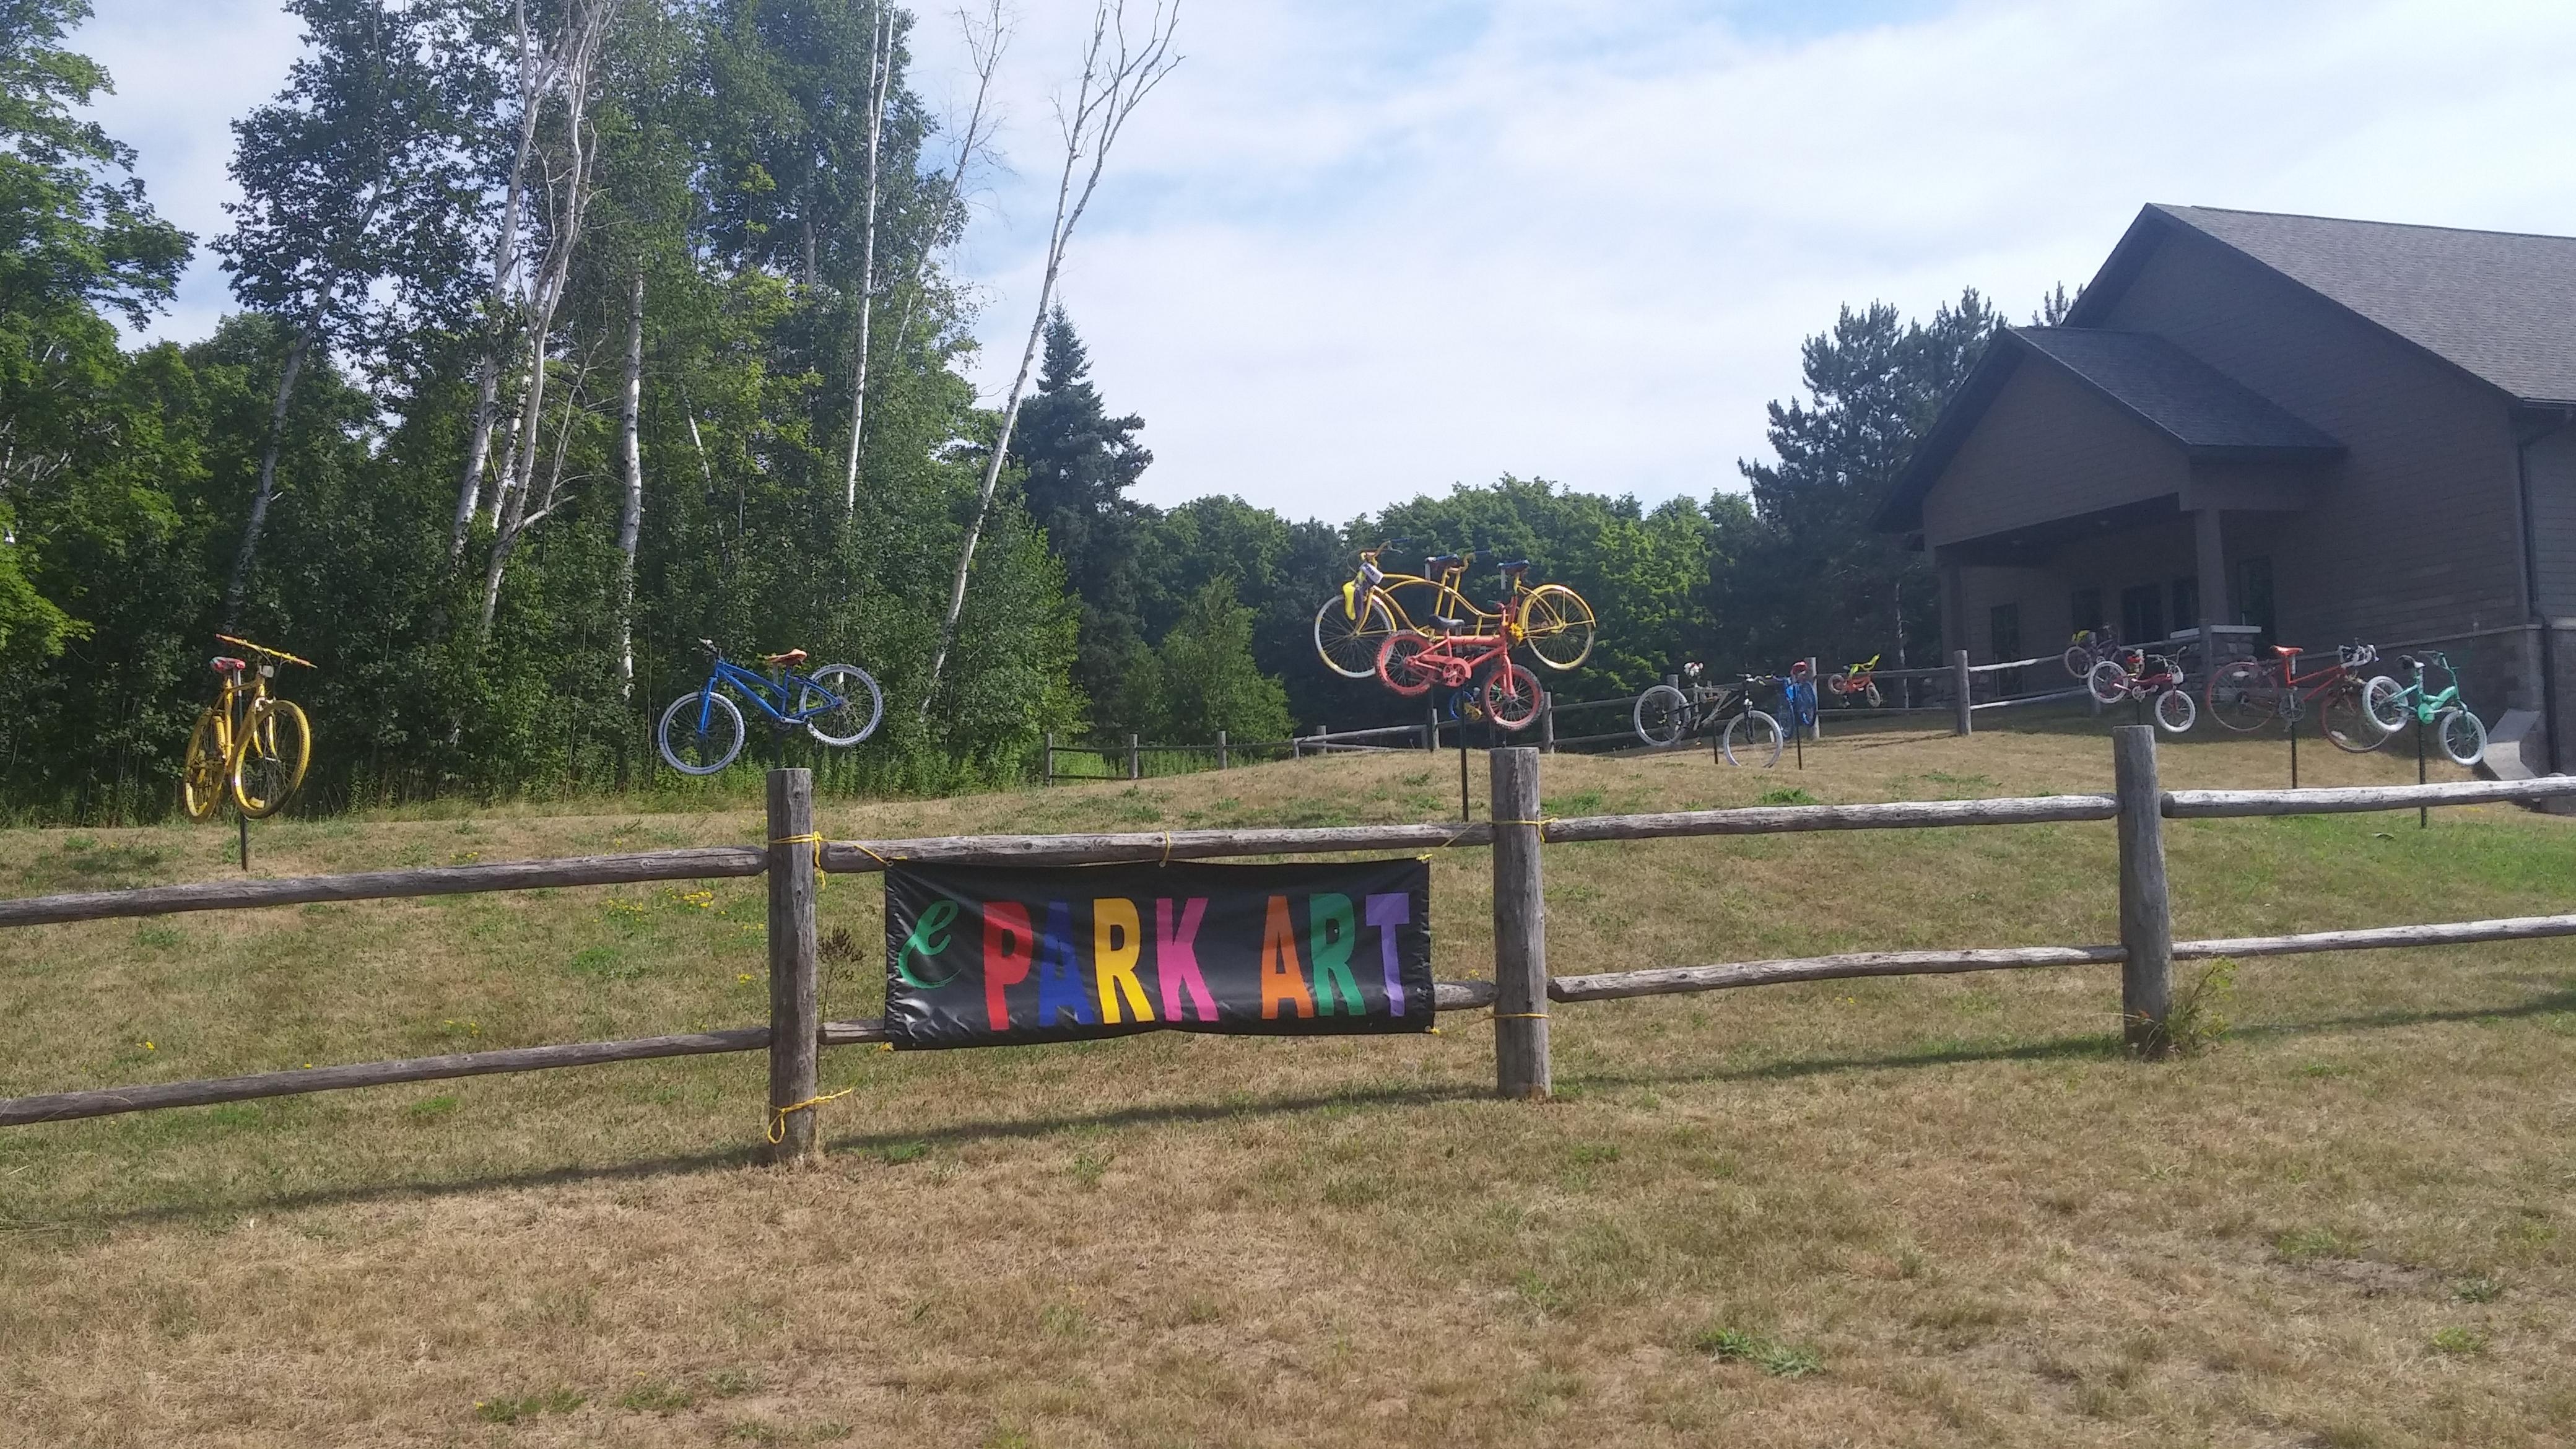 2015 Park Art - Bicycles